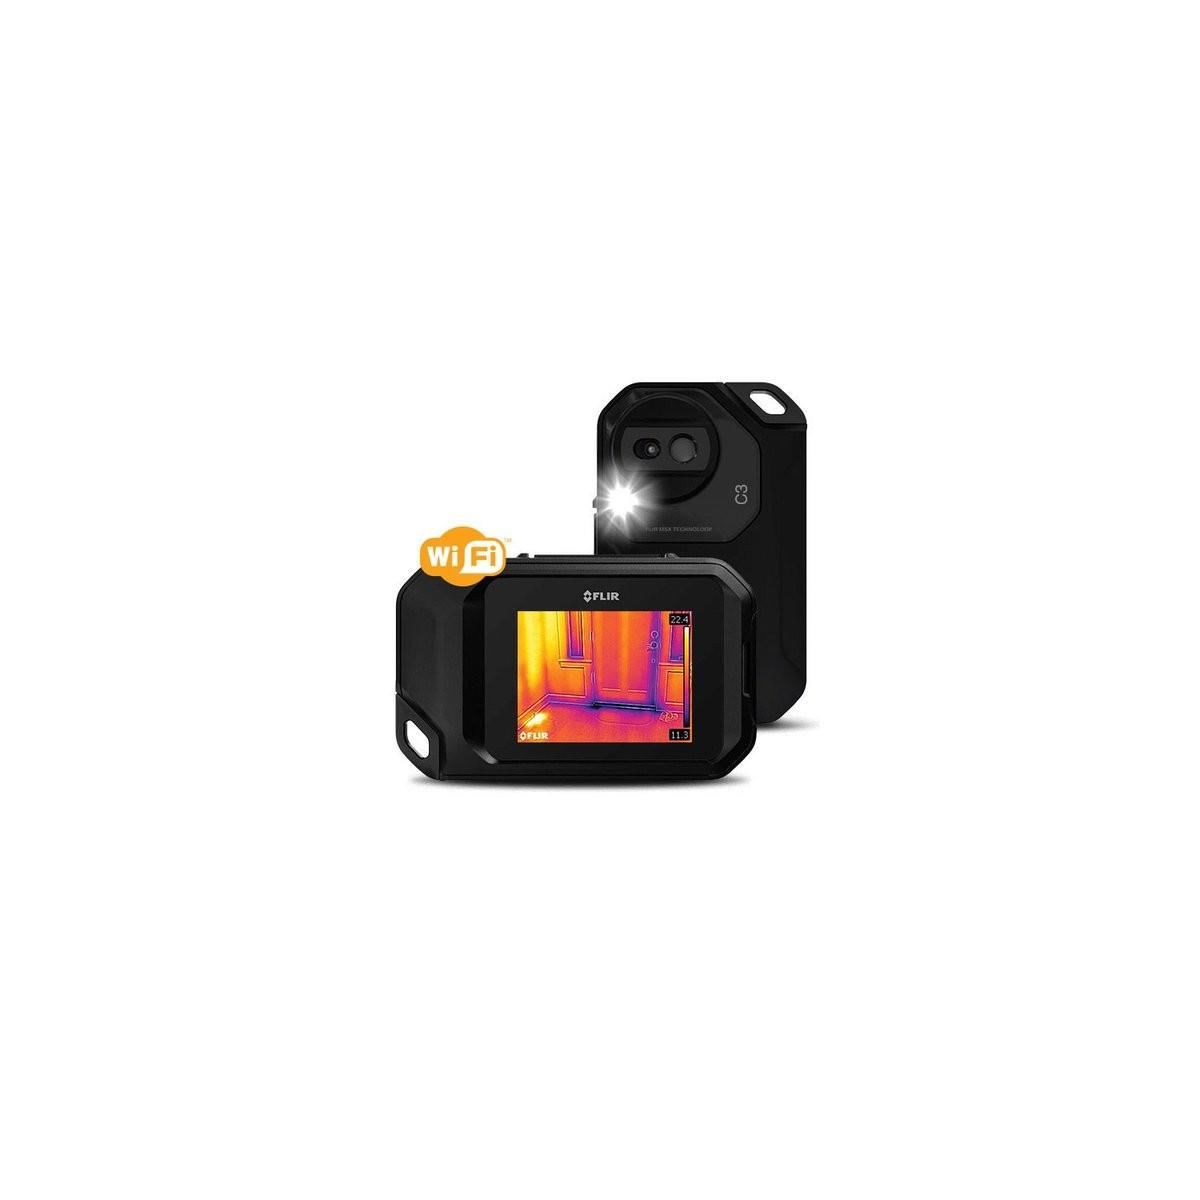 Surveillance-Camera-for-Smartphones